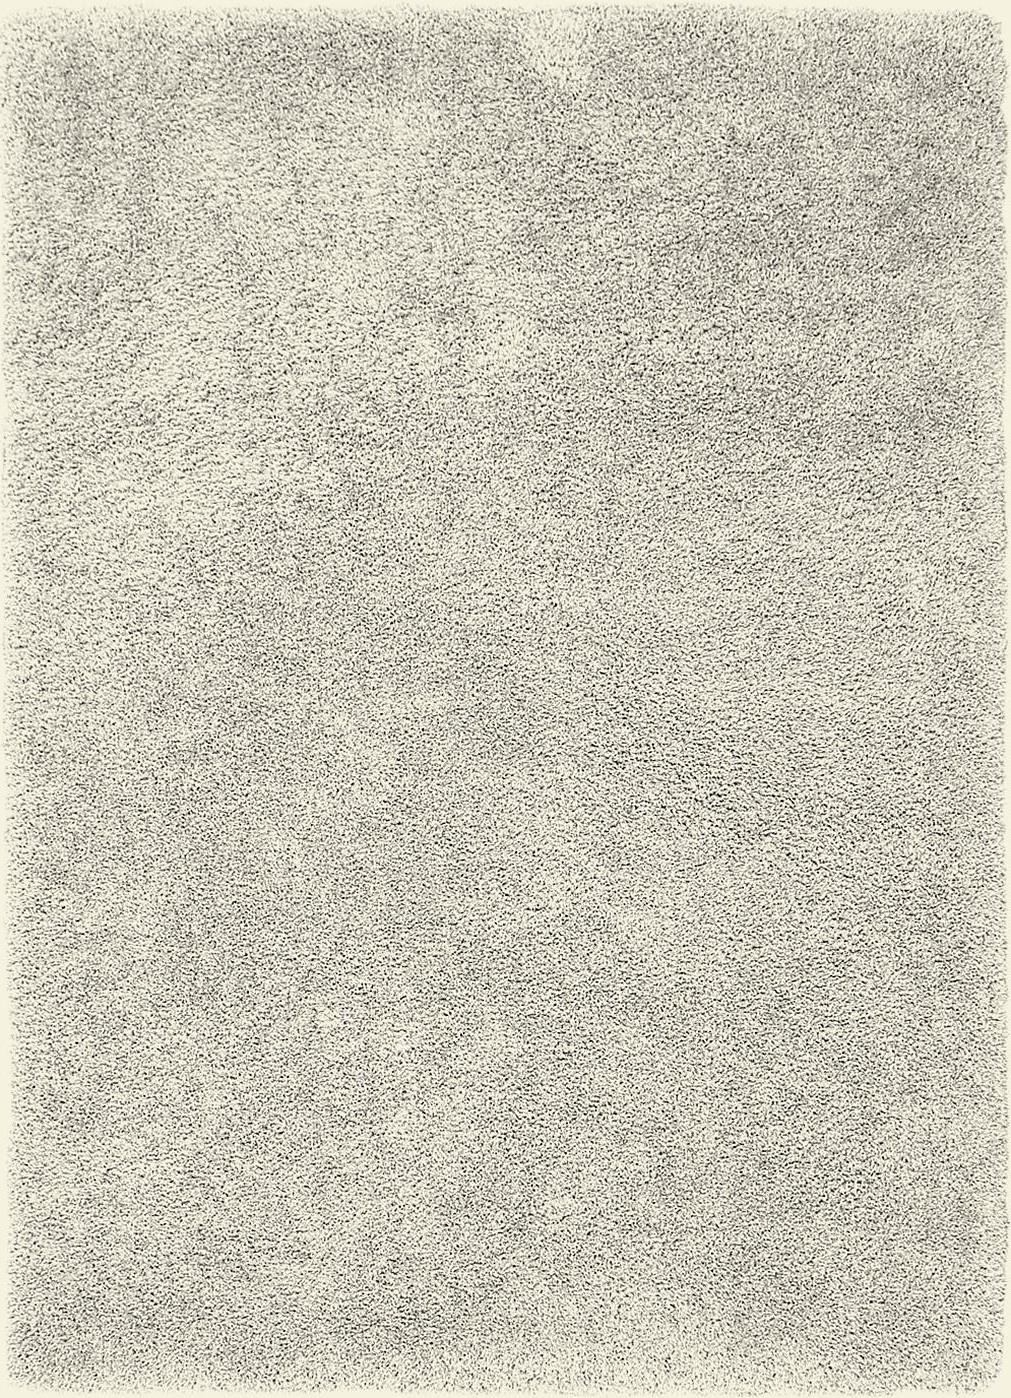 Tapis Long Poil Blanc tapis poil long blanc/beige, 45 mm, sur mesure